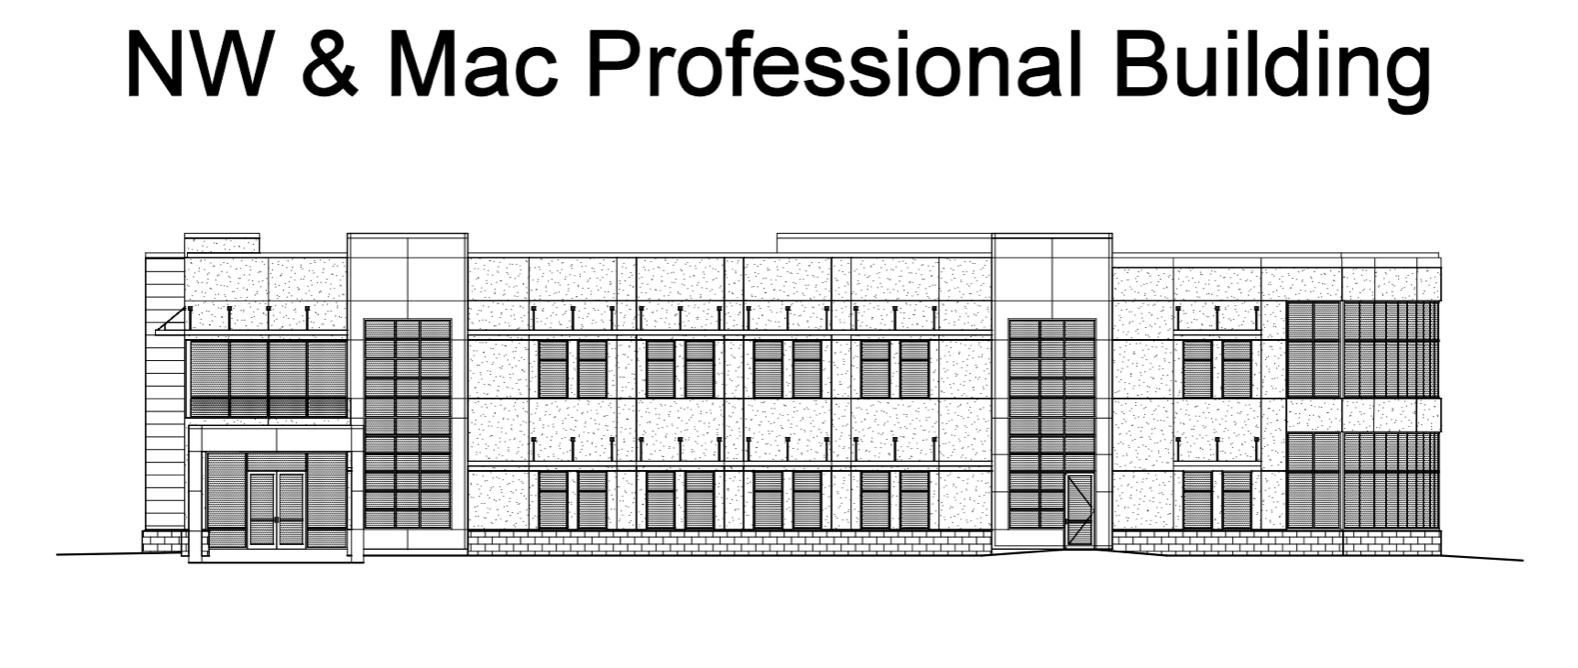 NW & Mac Professional Building Oklahoma City, Oklahoma